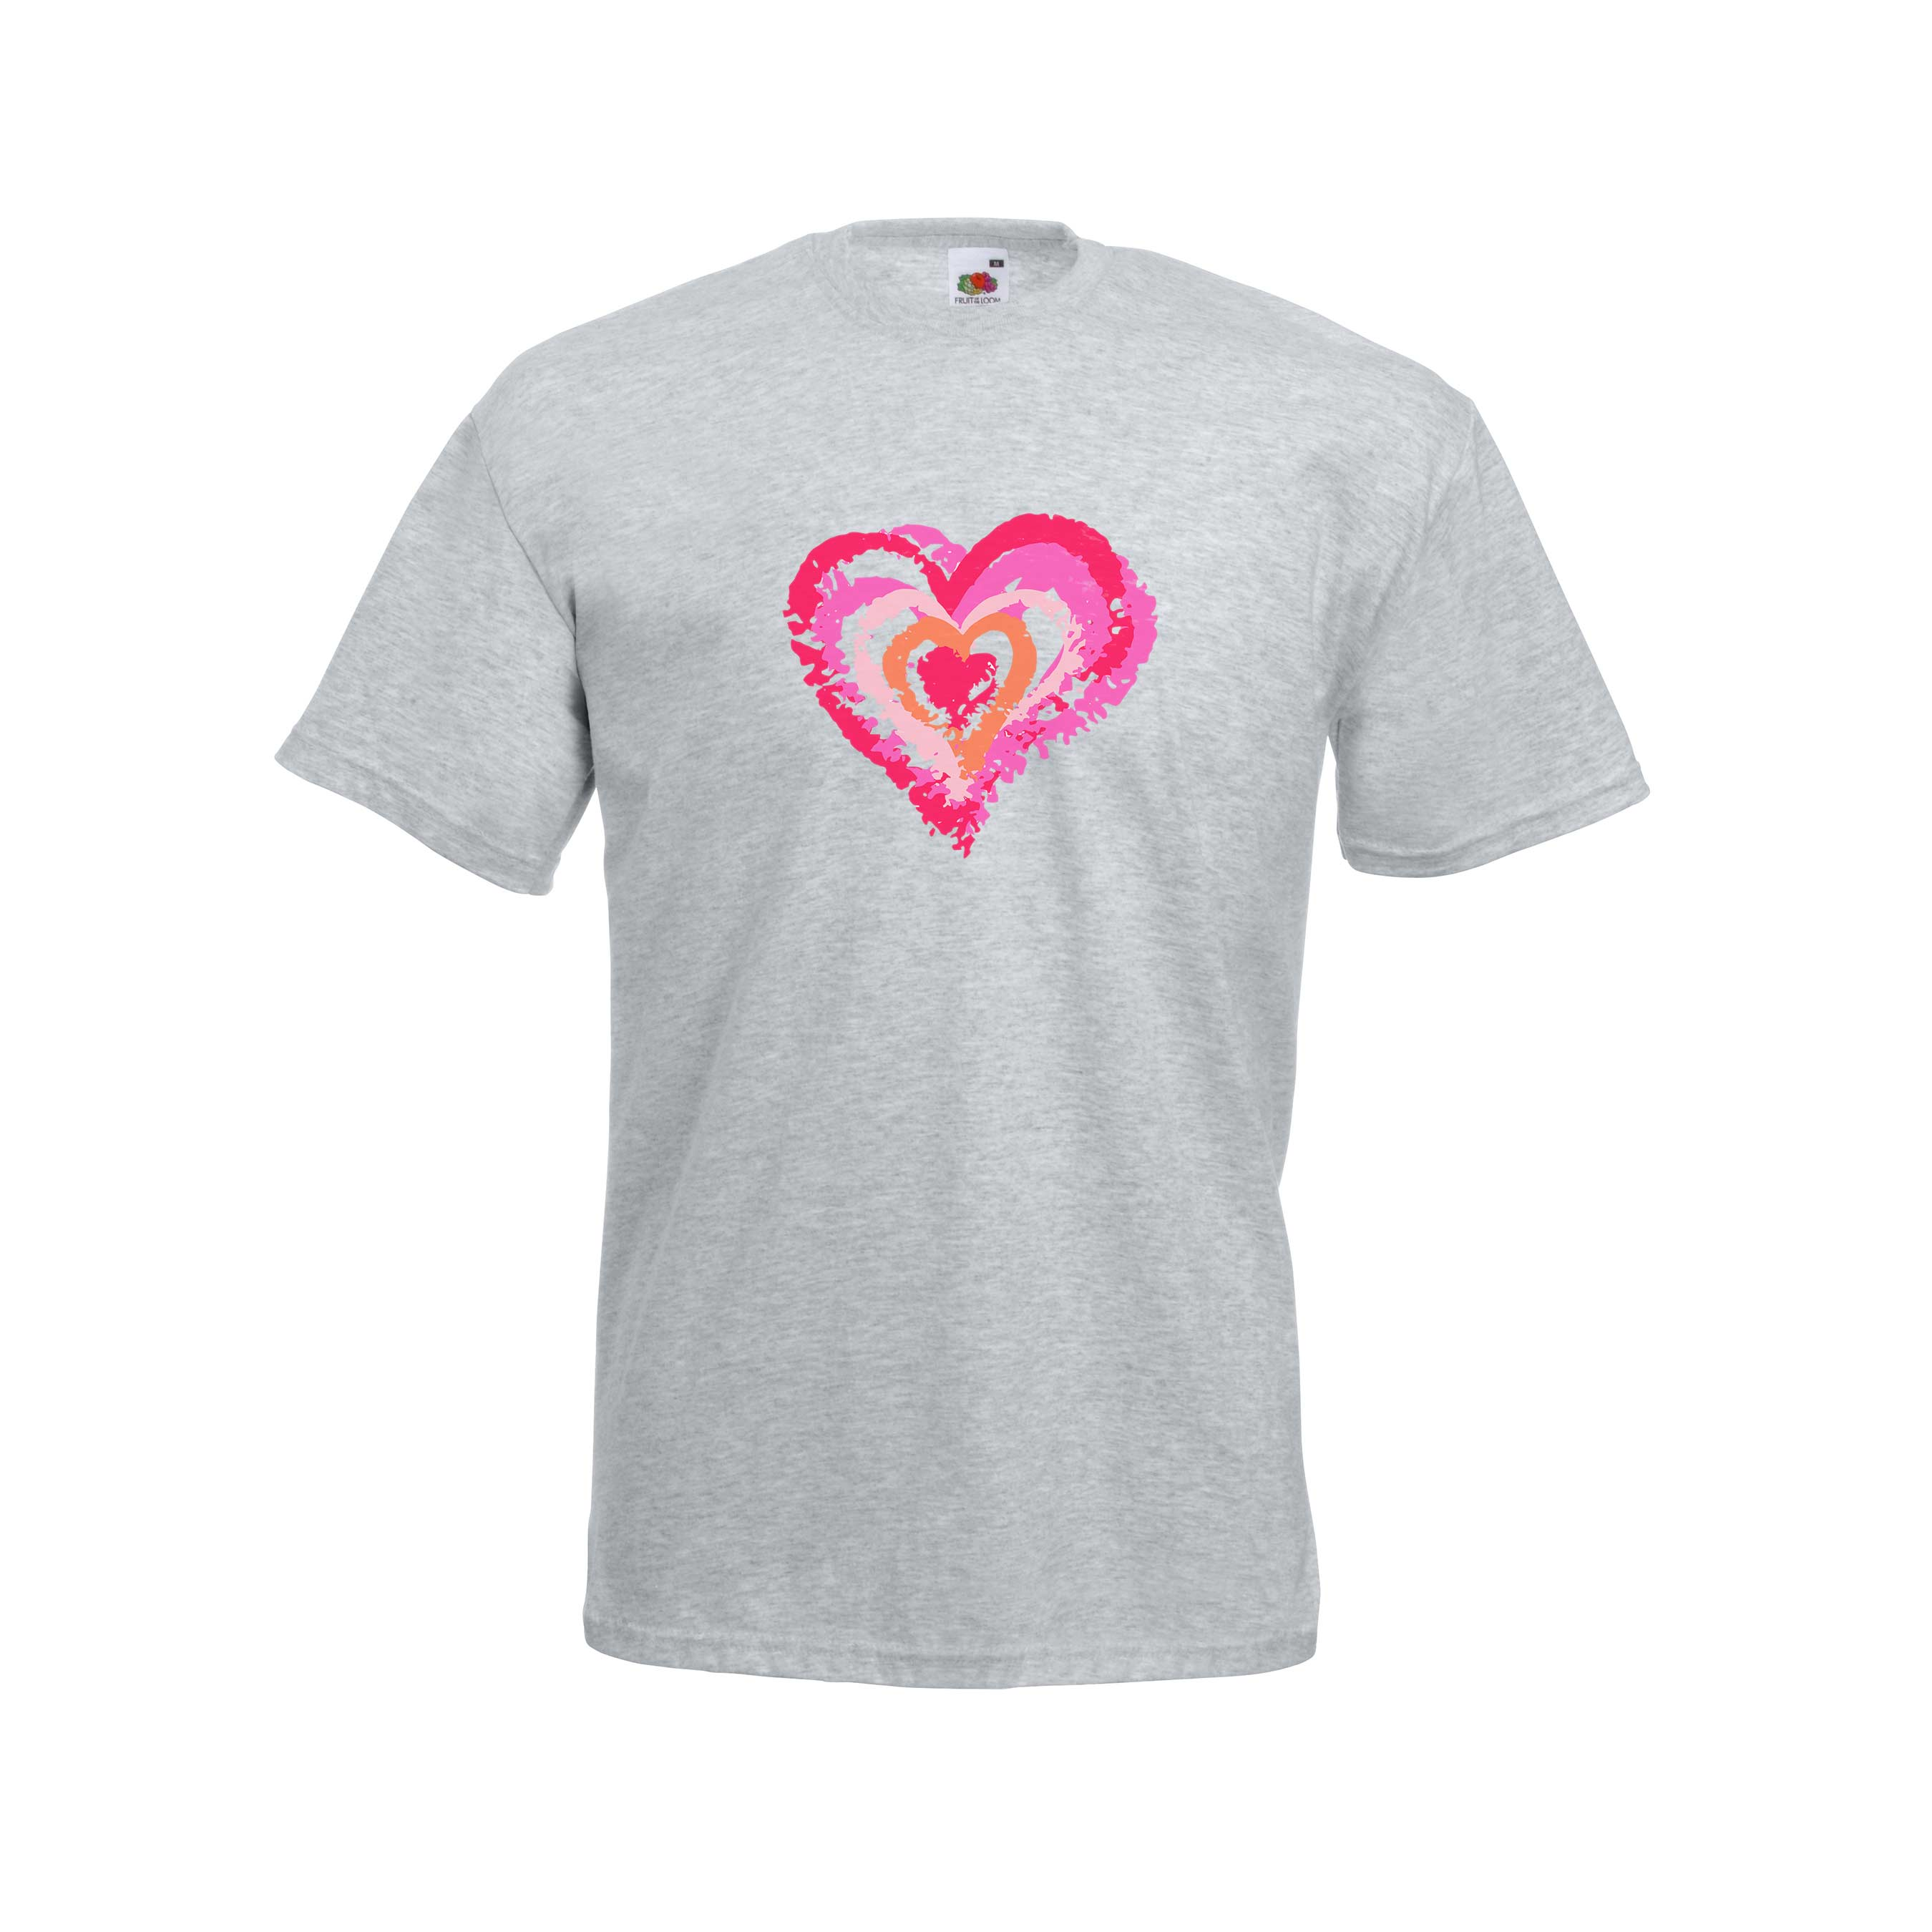 Grunge Heart Layers design for t-shirt, hoodie & sweatshirt